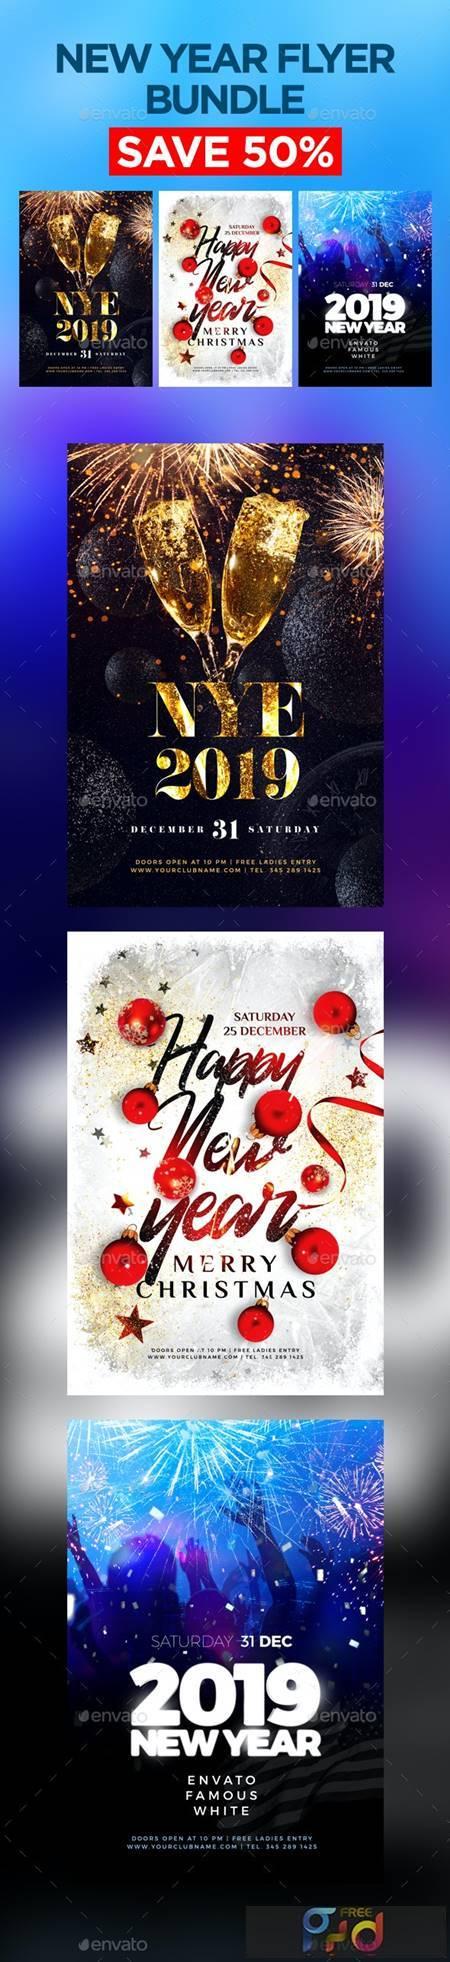 New Year Flyer Bundle 22930630 1